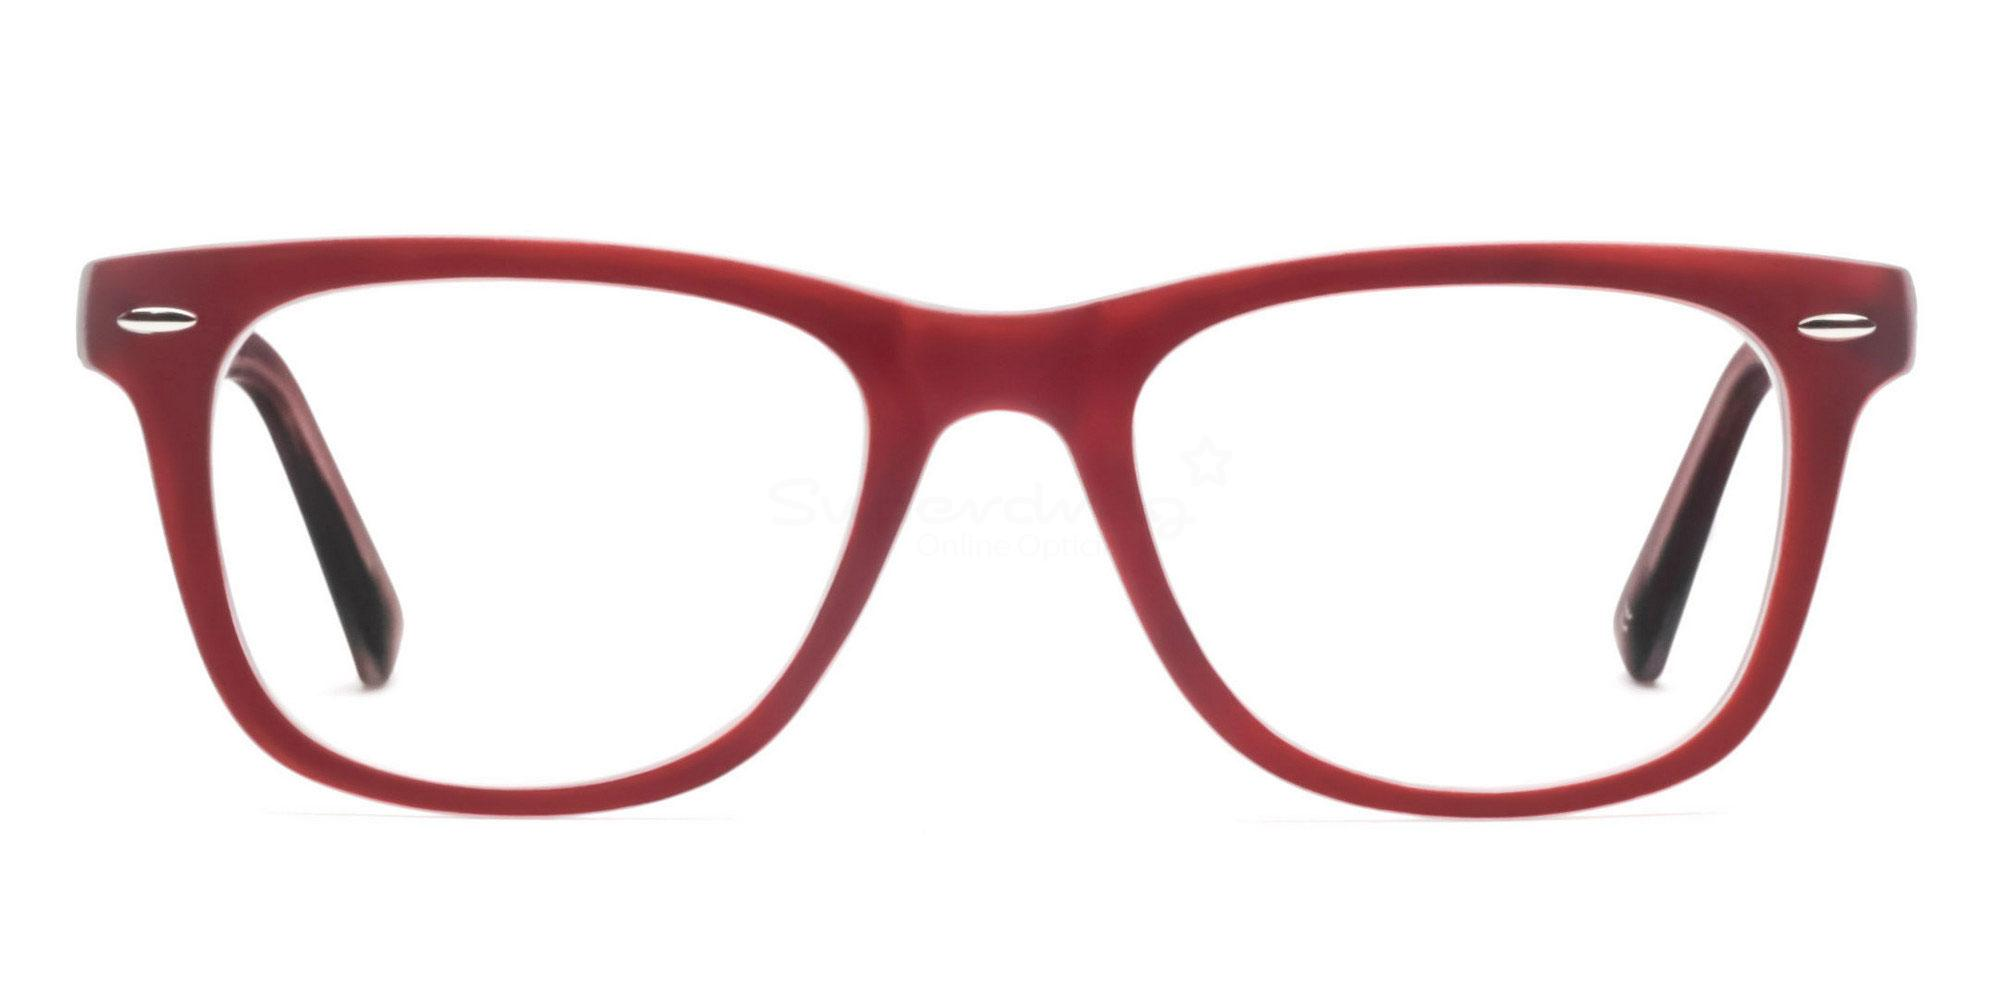 C13 8121 - Maroon on Transparent Glasses, Helium